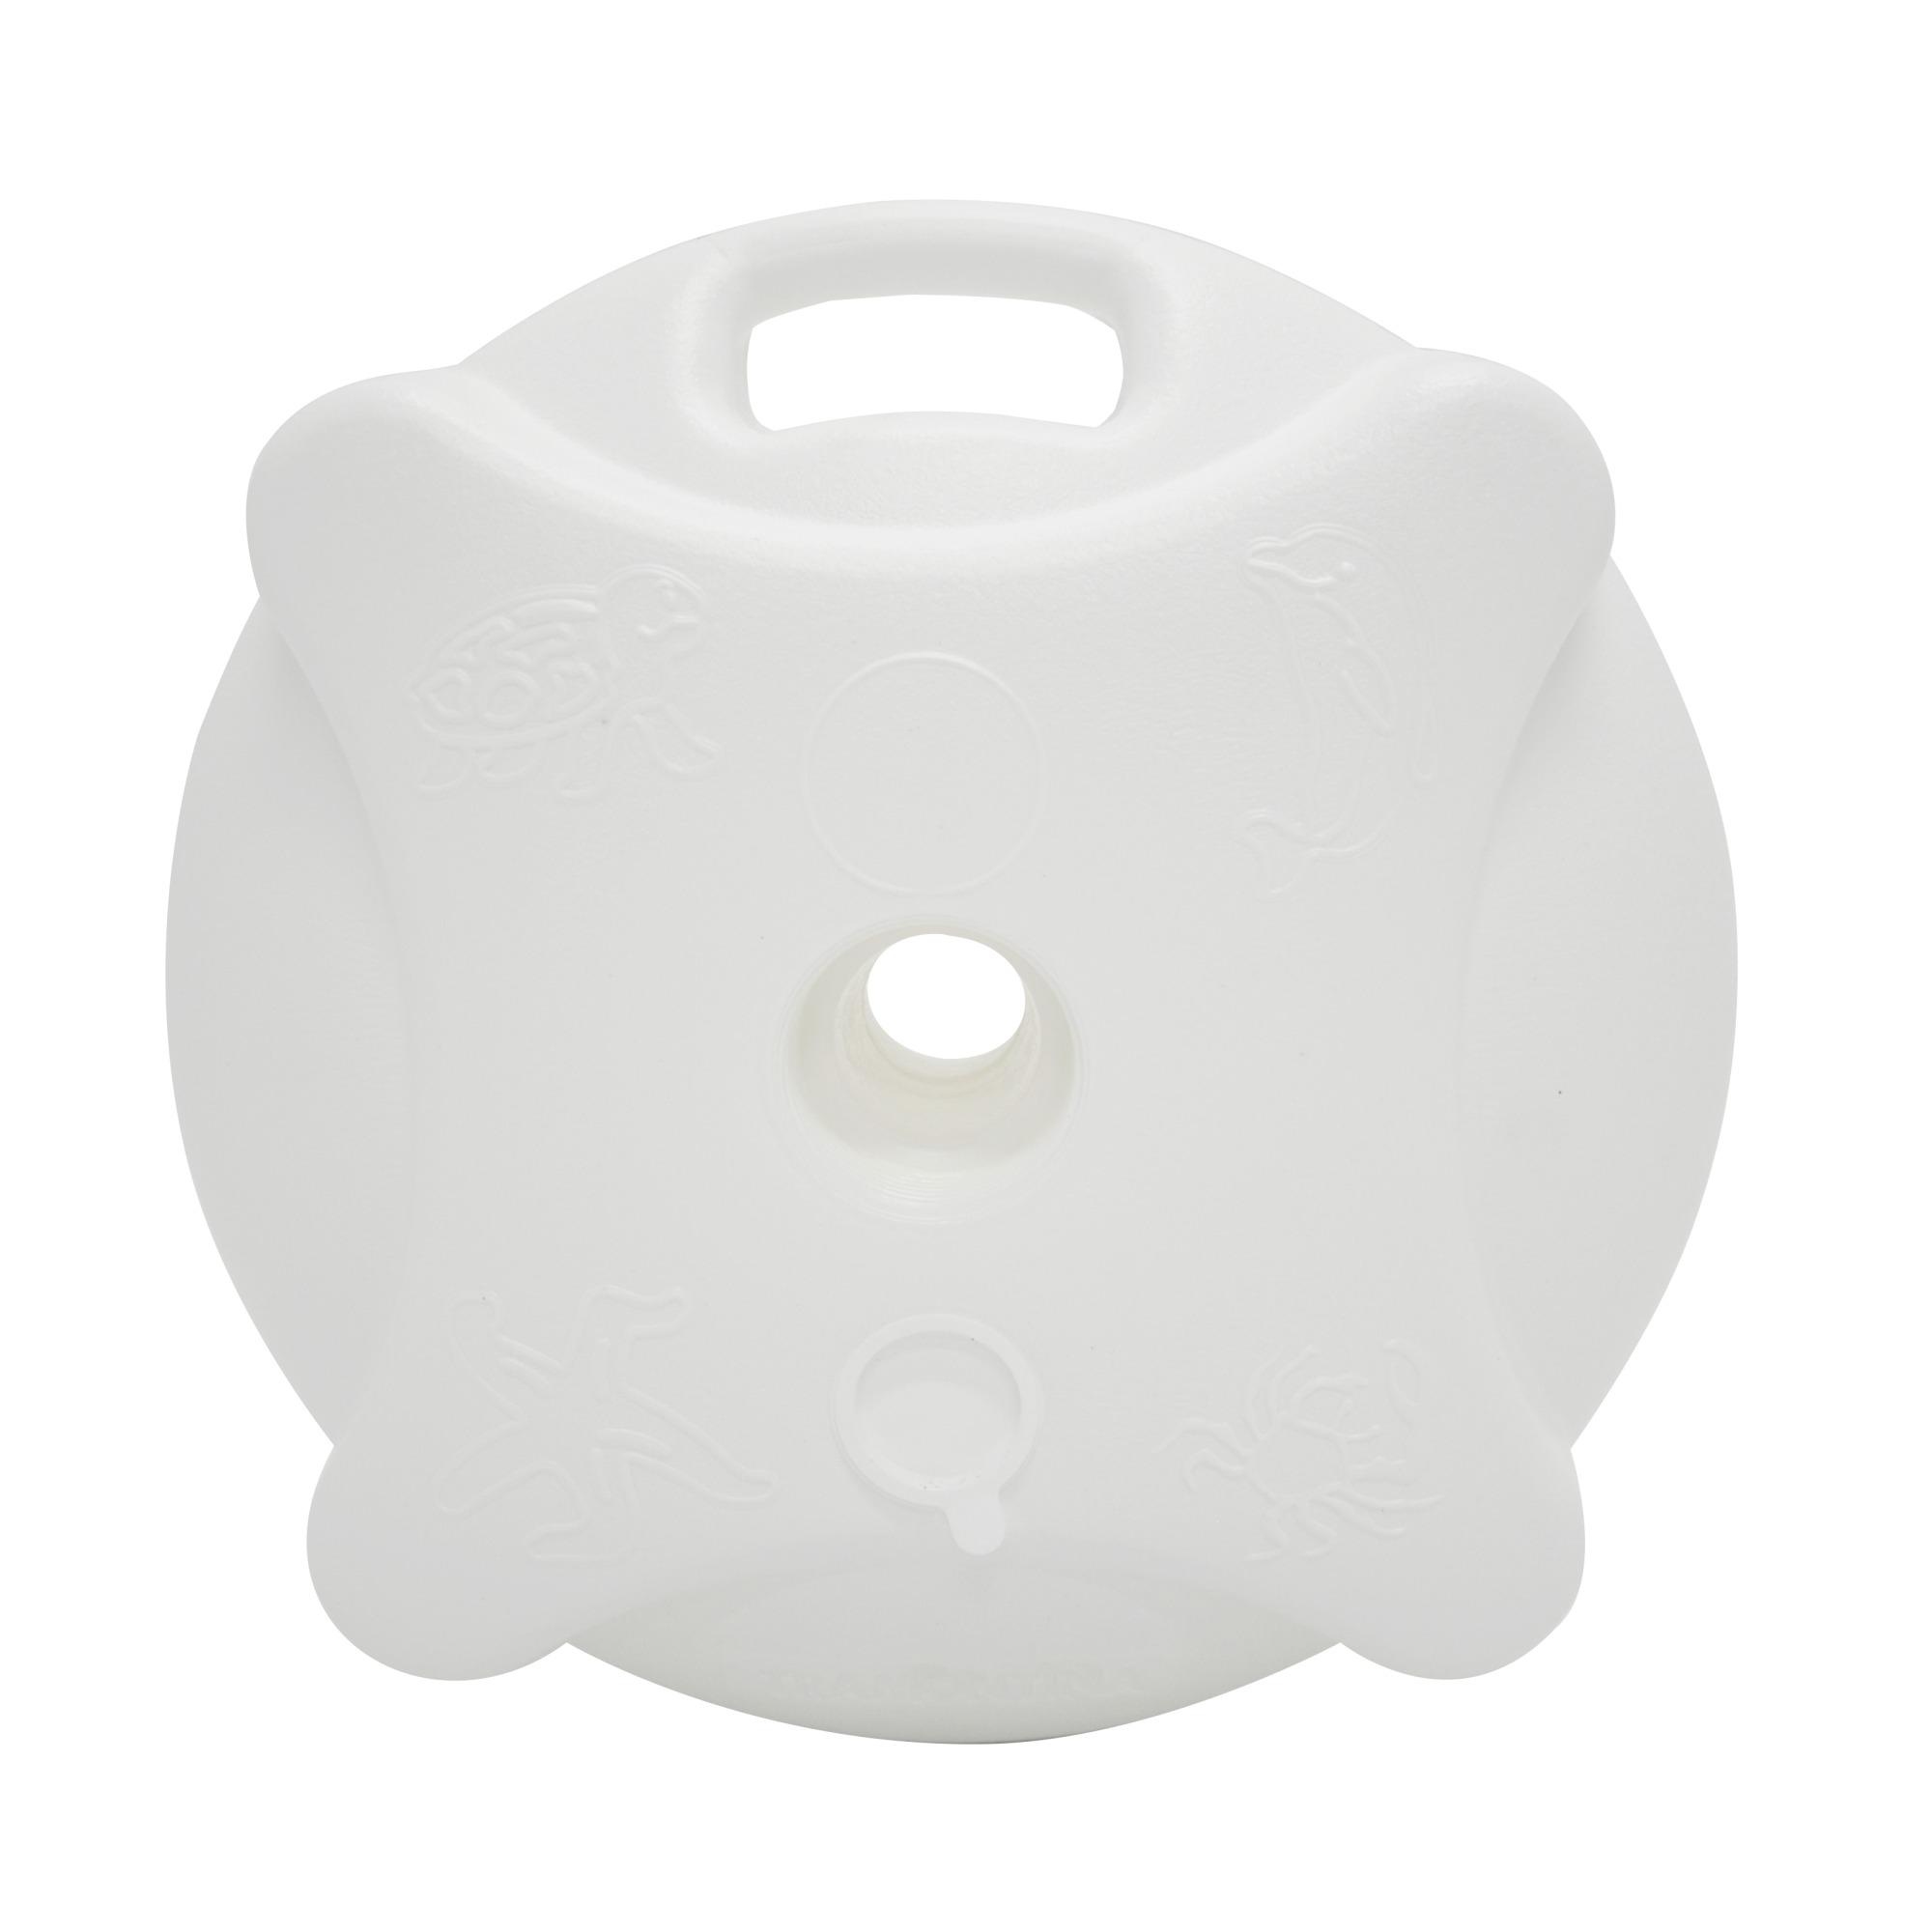 Base para Ombrelone Plastico Branco - Tramontina